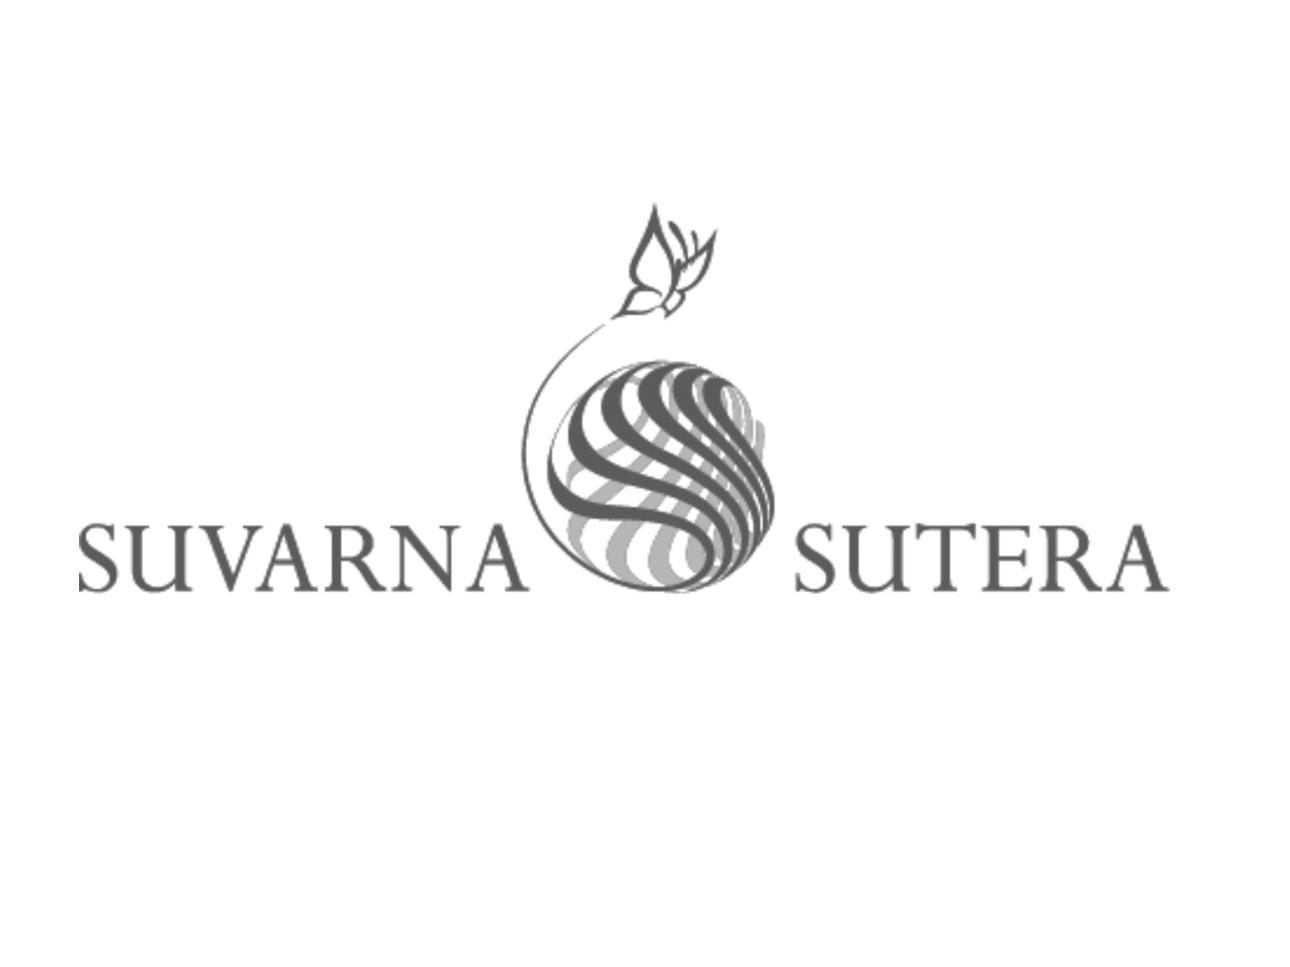 SUVARNA